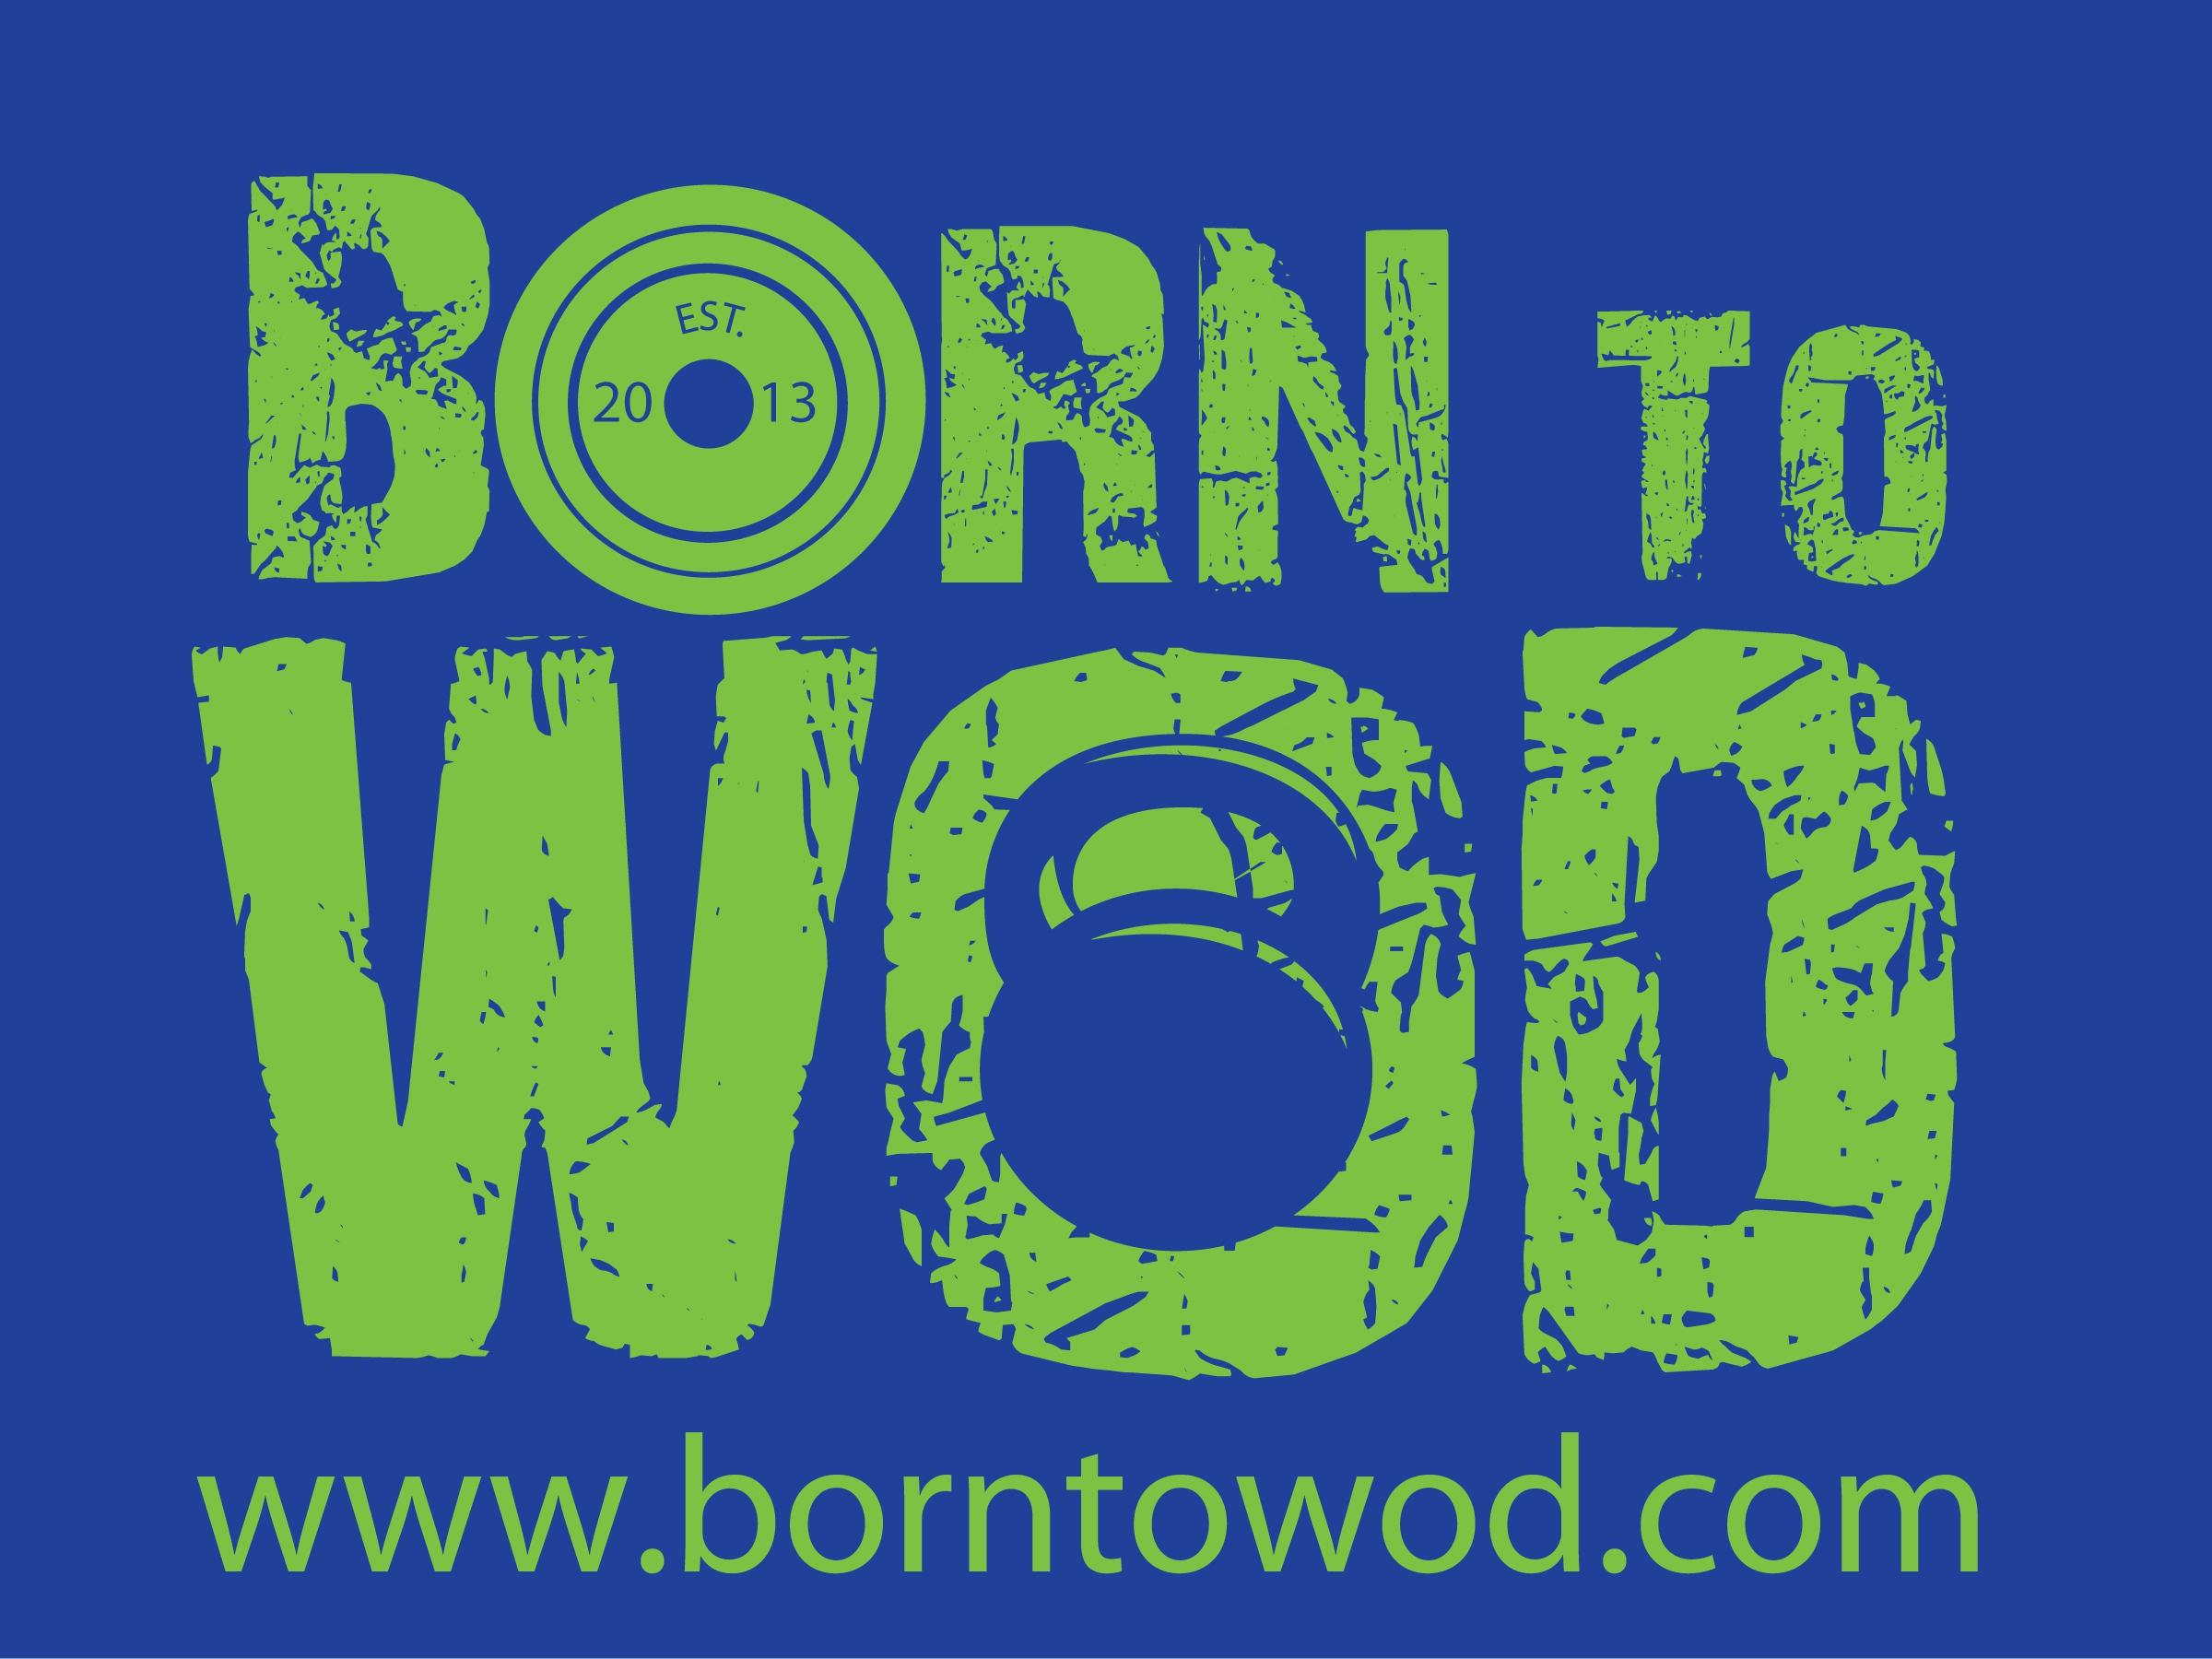 Born to WOD